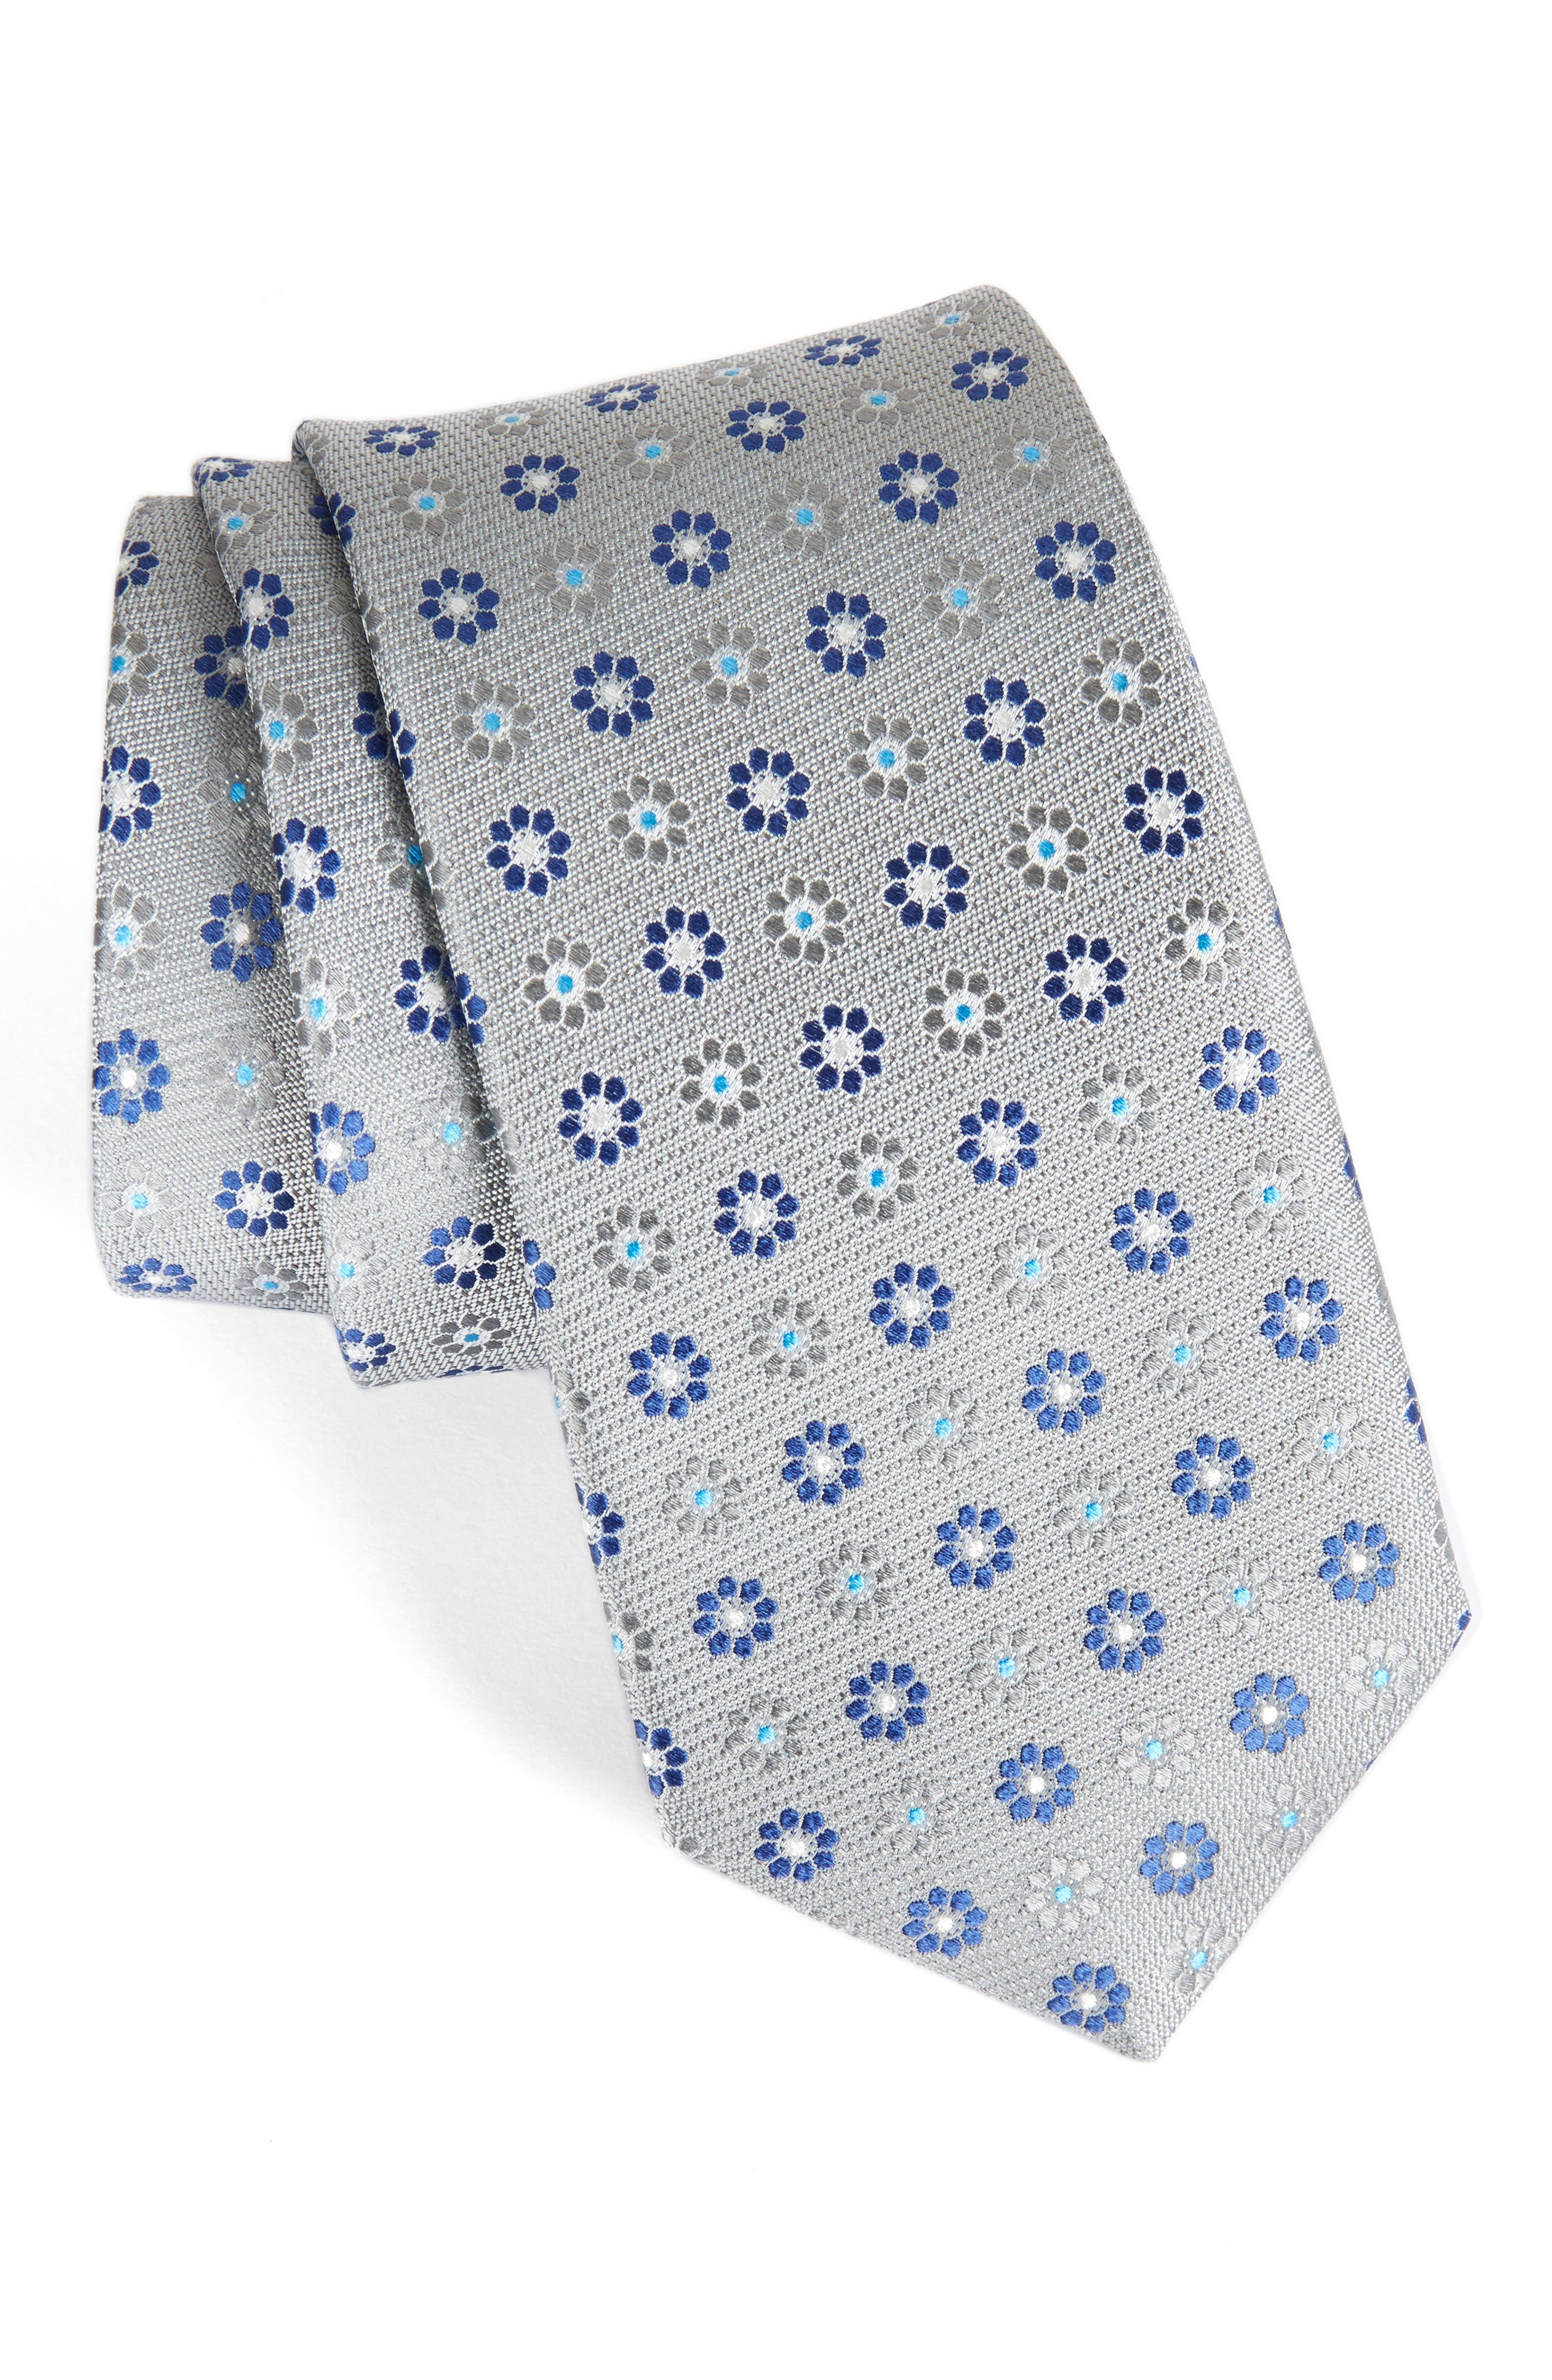 John W. Nordstrom Floral Silk Tie,                             Main thumbnail 2, color,